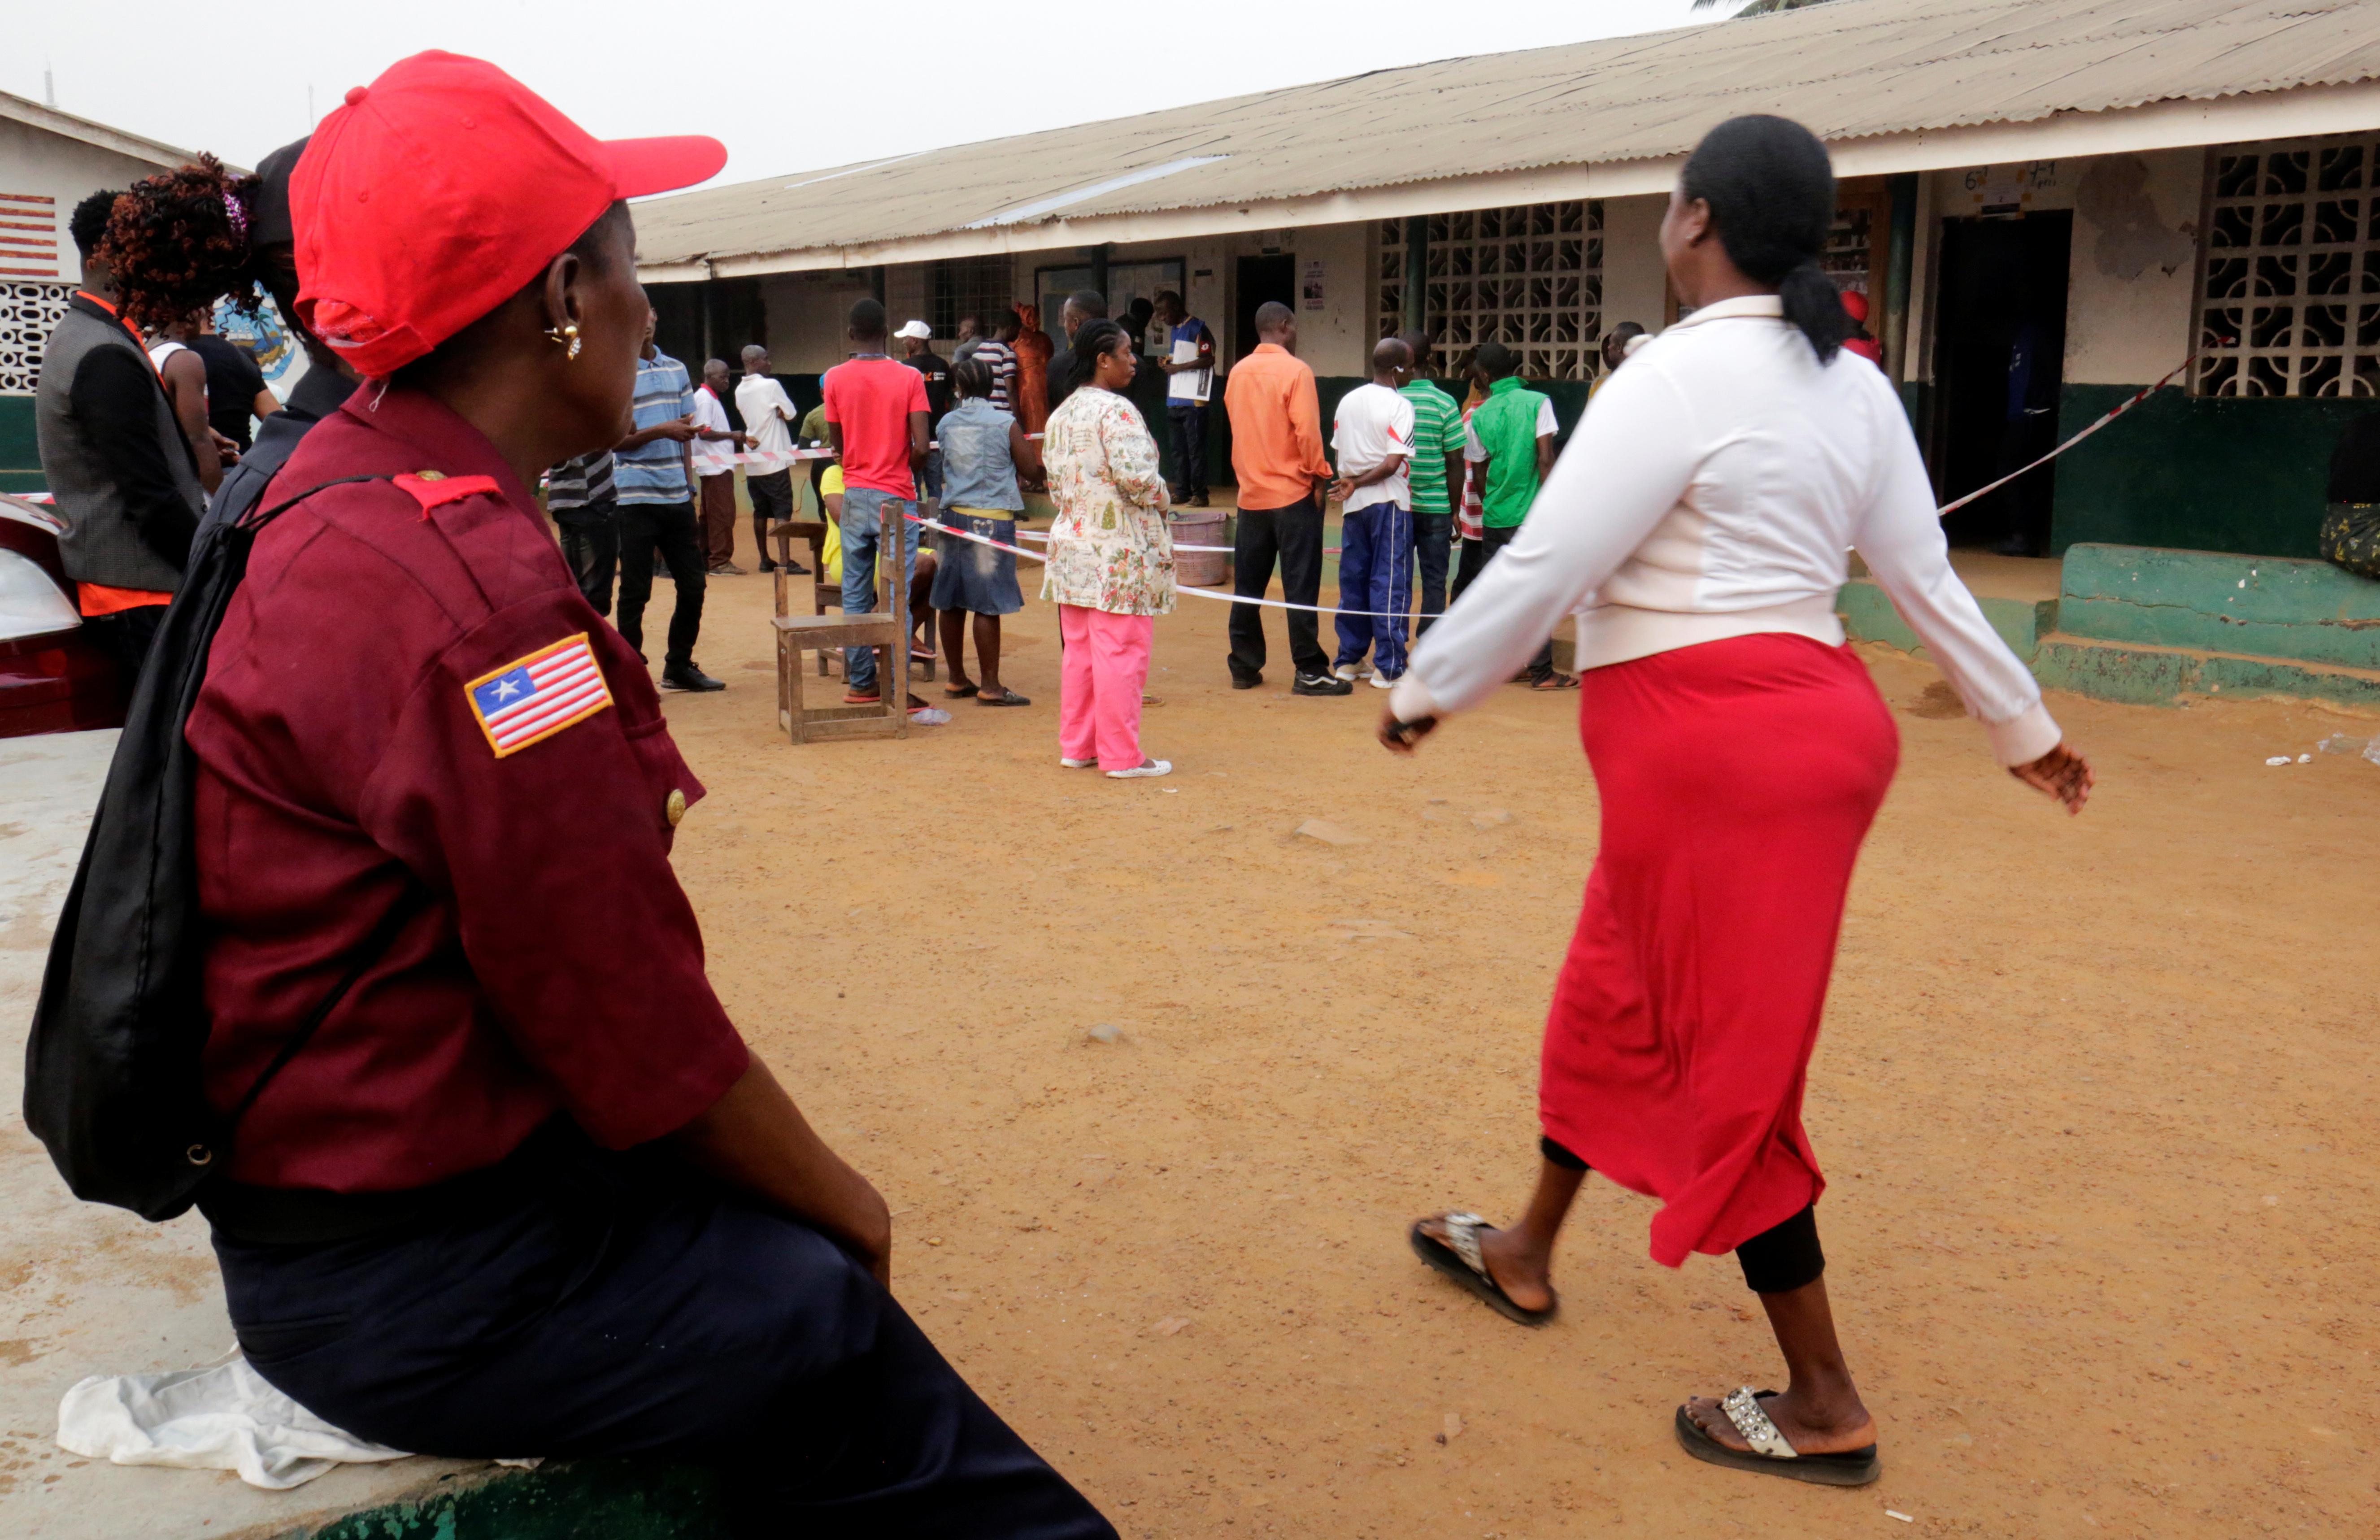 توافد مواطنو ليبيريا